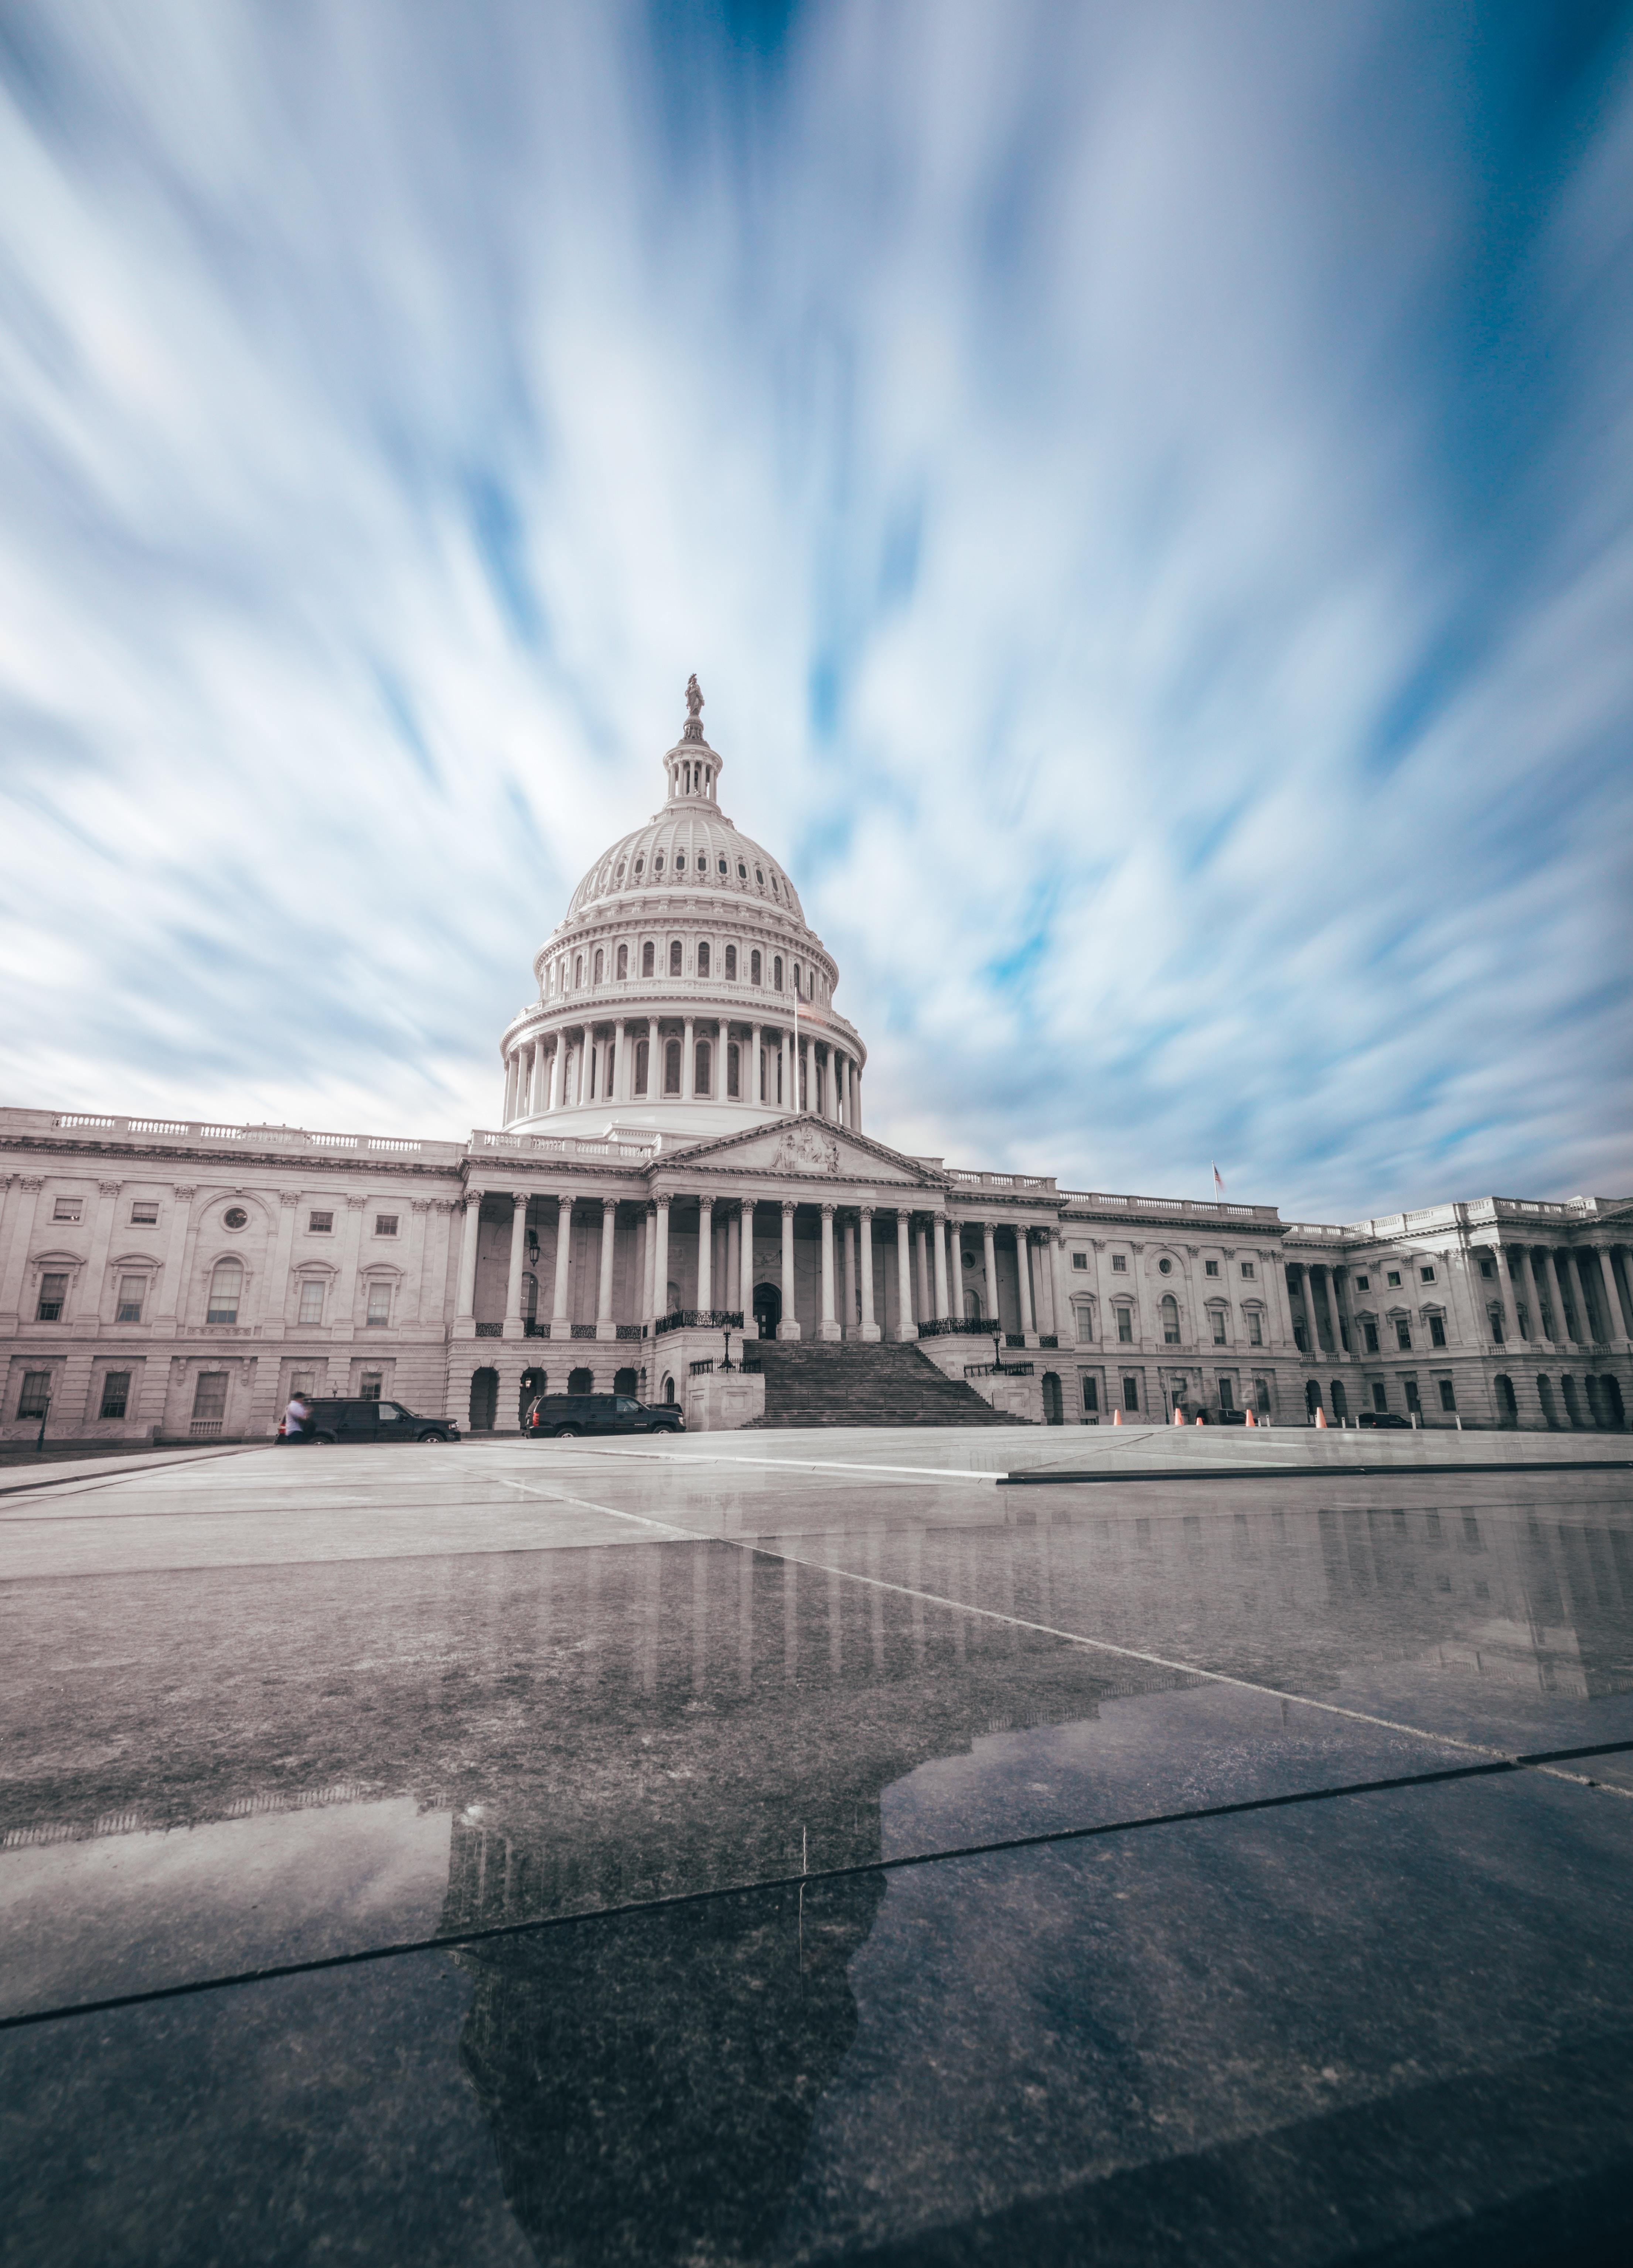 Washington Begins VPP Process